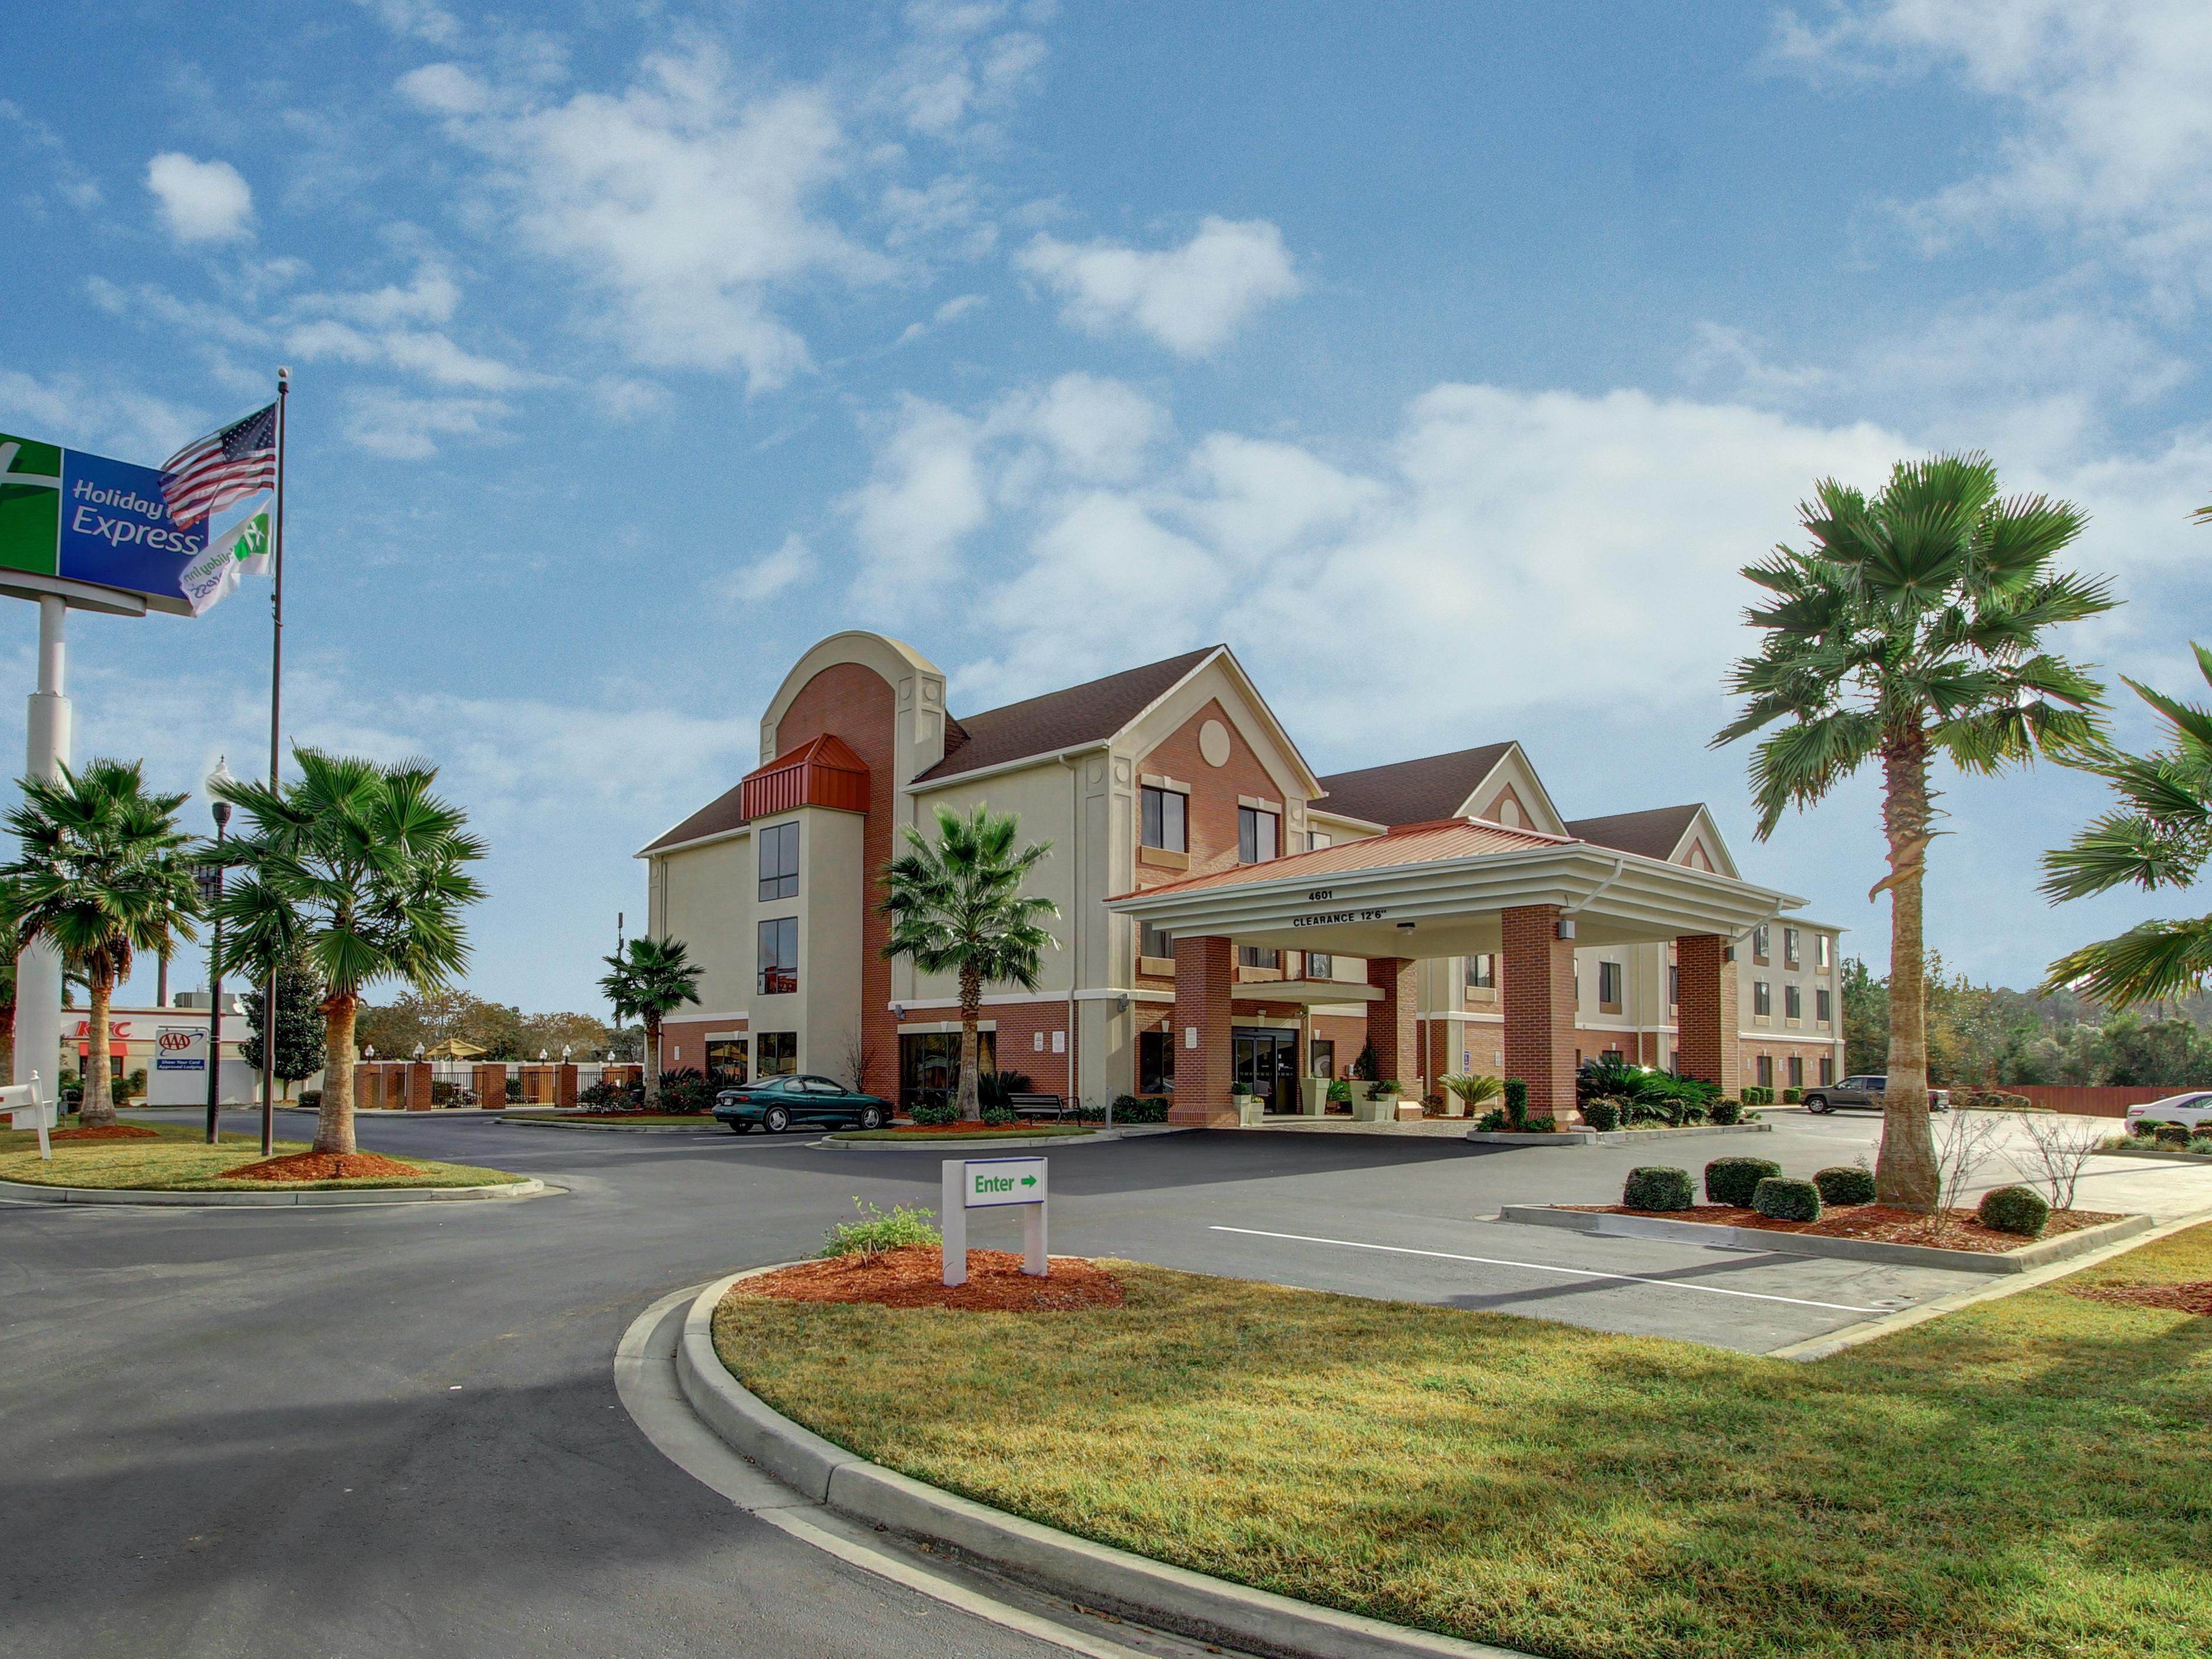 Find Port Wentworth Hotels | Top 18 Hotels in Port Wentworth, GA by IHG